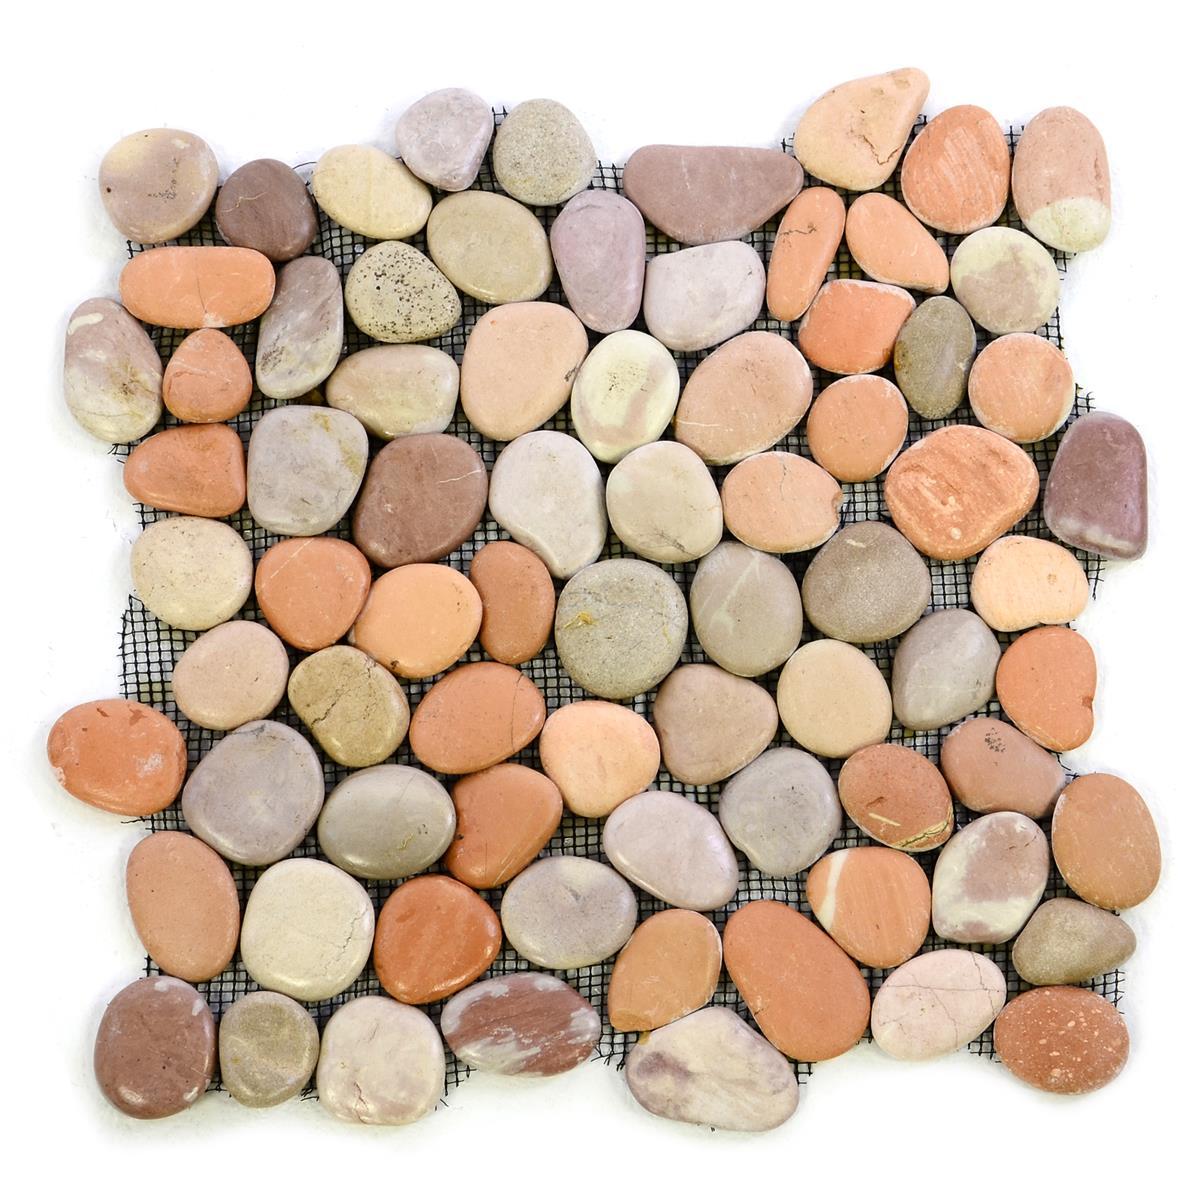 DIVERO 11 Fliesenmatten Flussstein Mosaikfliesen terrakotta á 32 x 32 cm